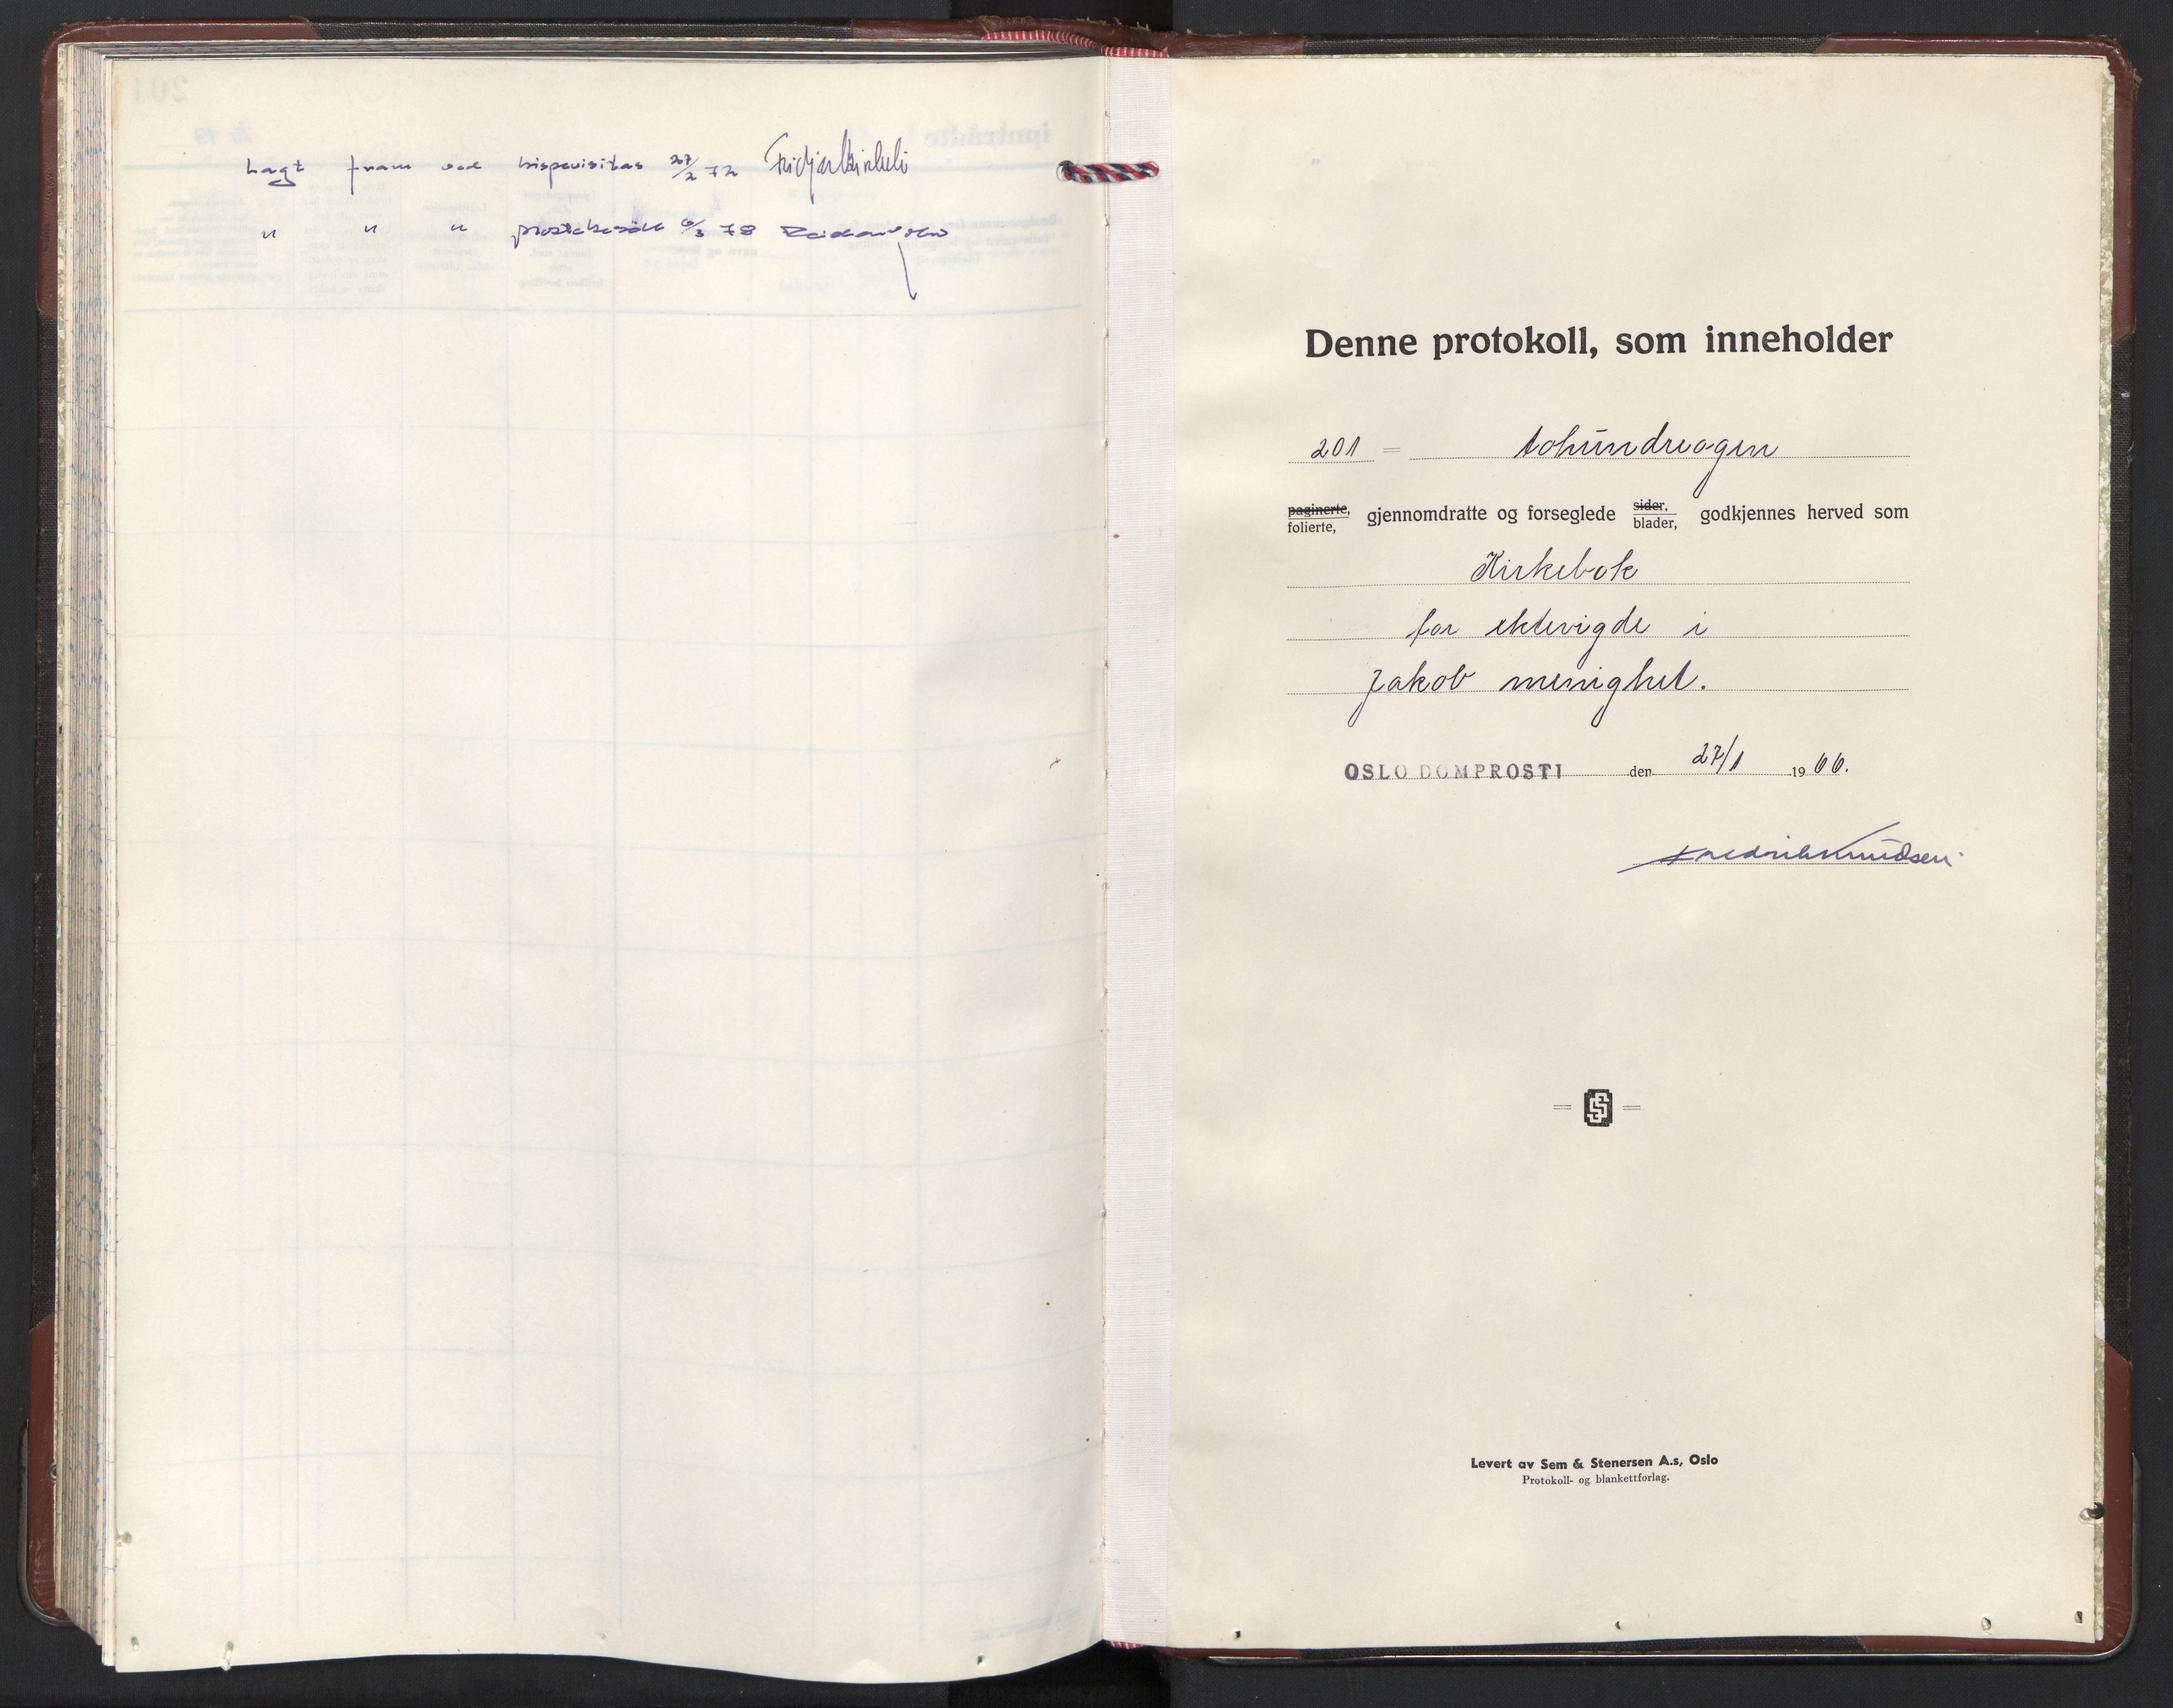 SAO, Jakob prestekontor Kirkebøker, F/Fa/L0022: Ministerialbok nr. 22, 1966-1984